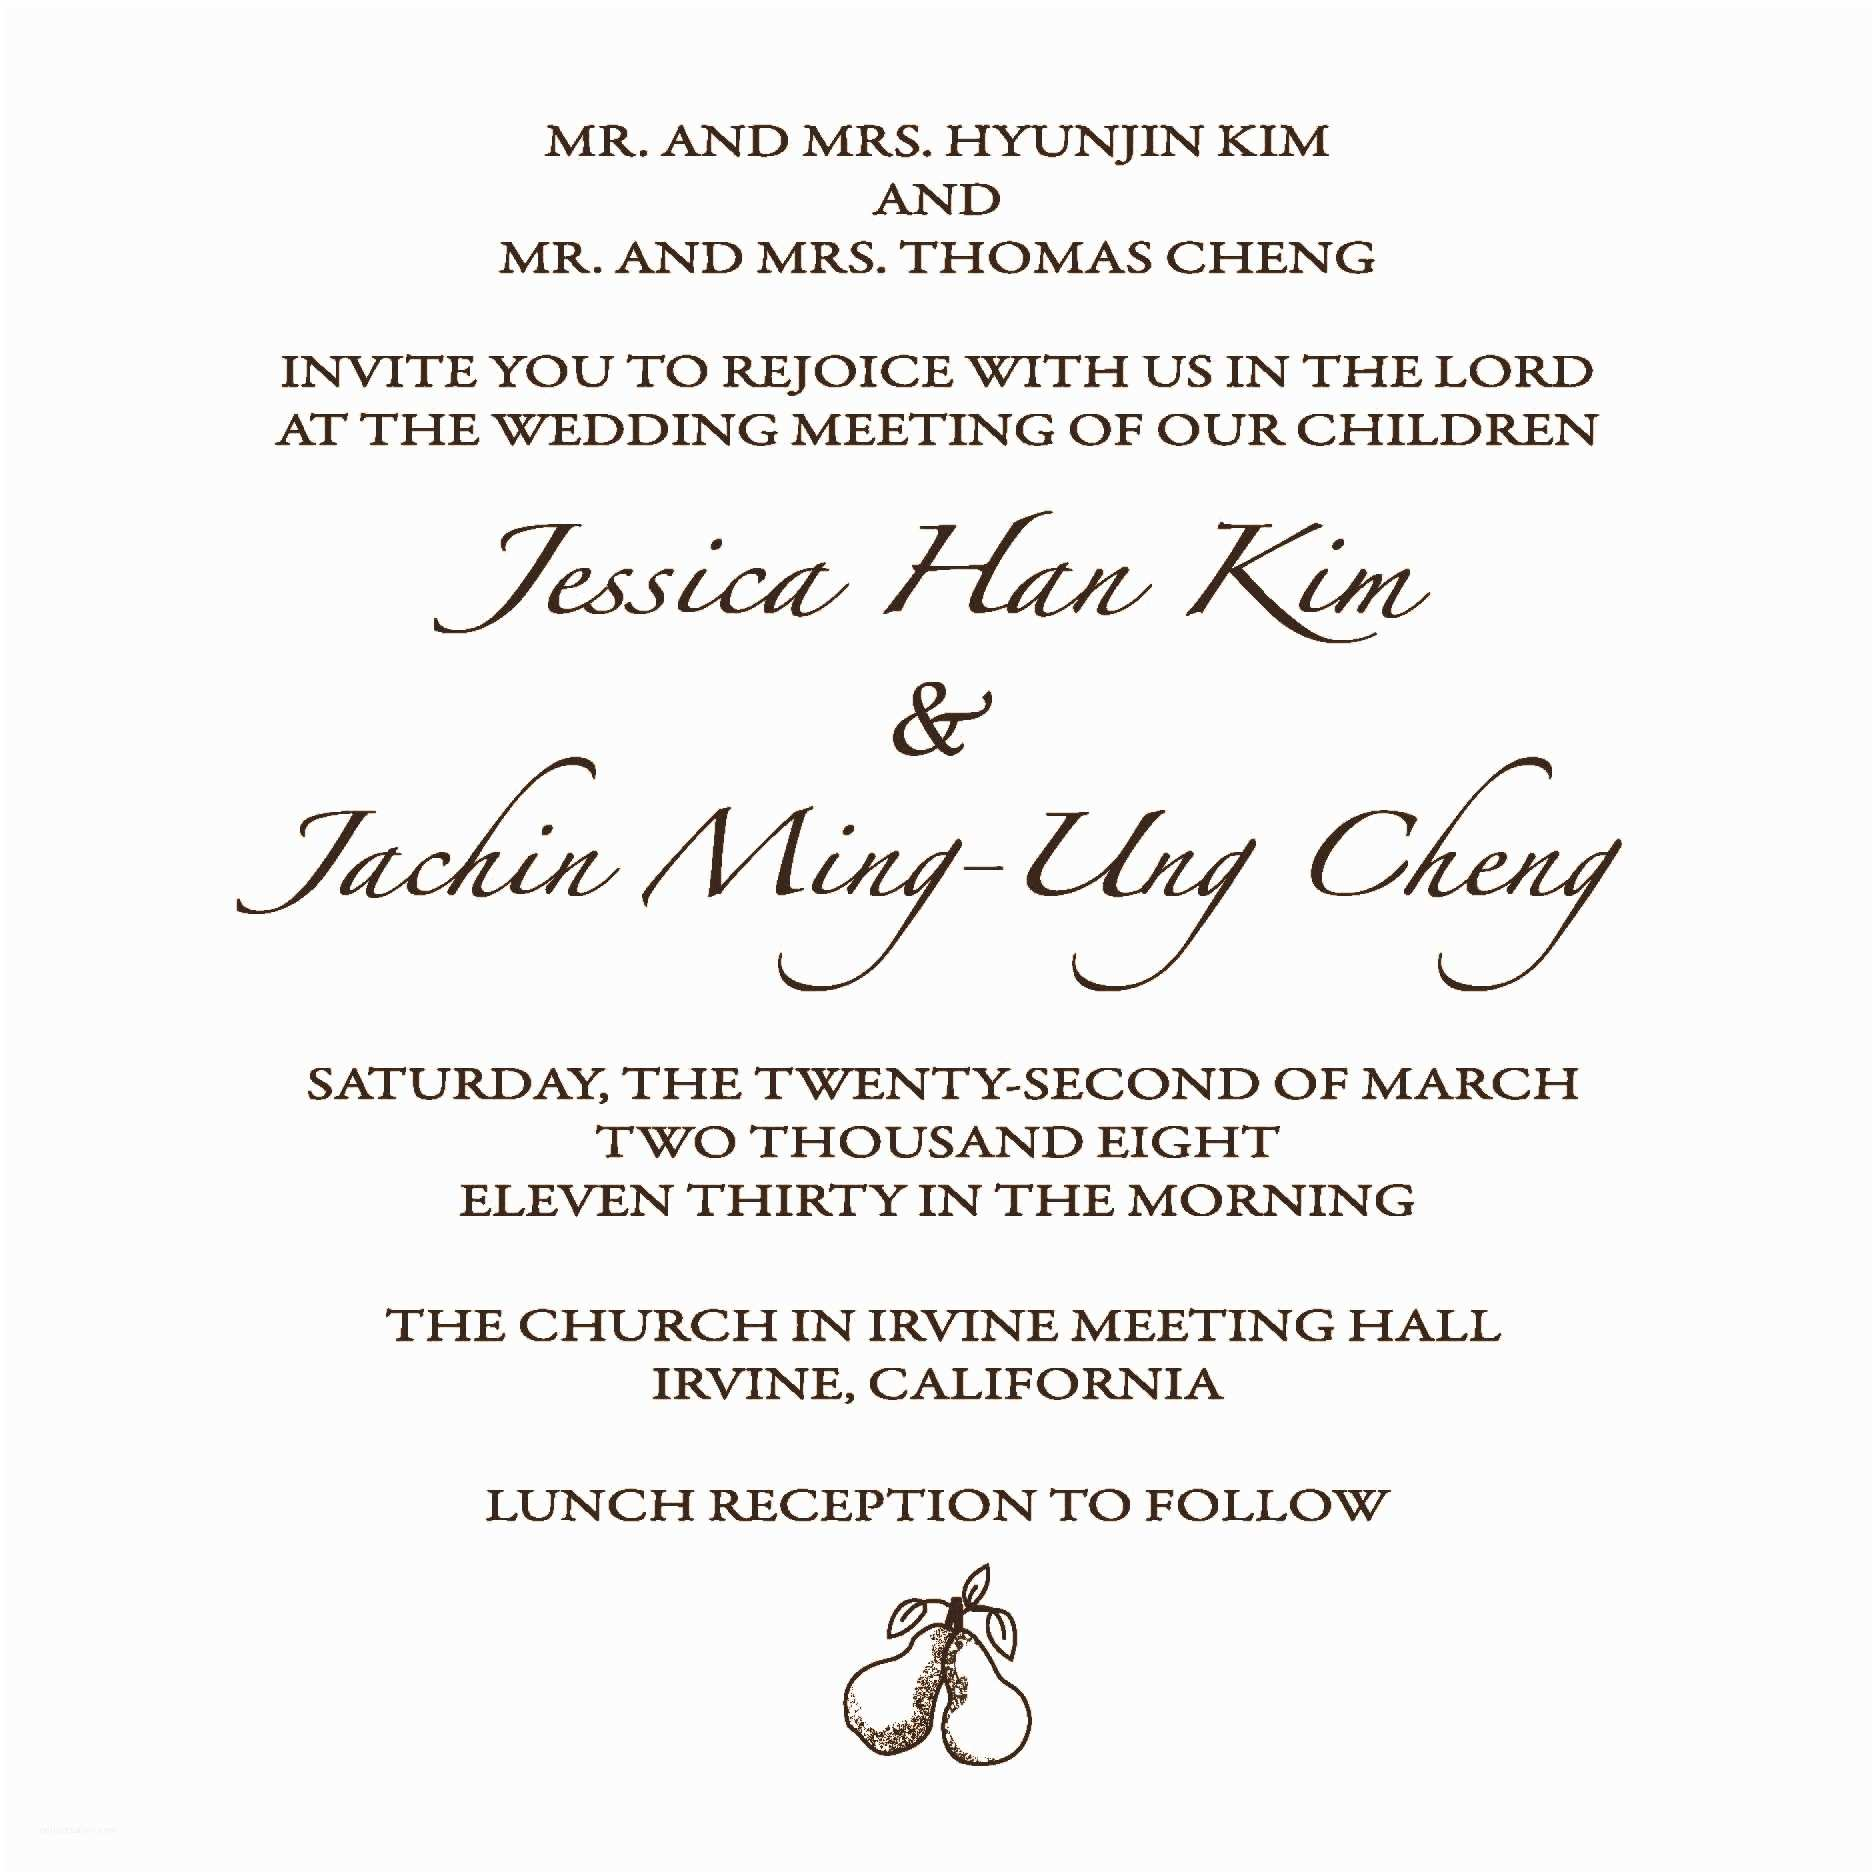 Wedding Invitations with Photo Insert Desktop Publishing by Greg Szilagyi at Coroflot